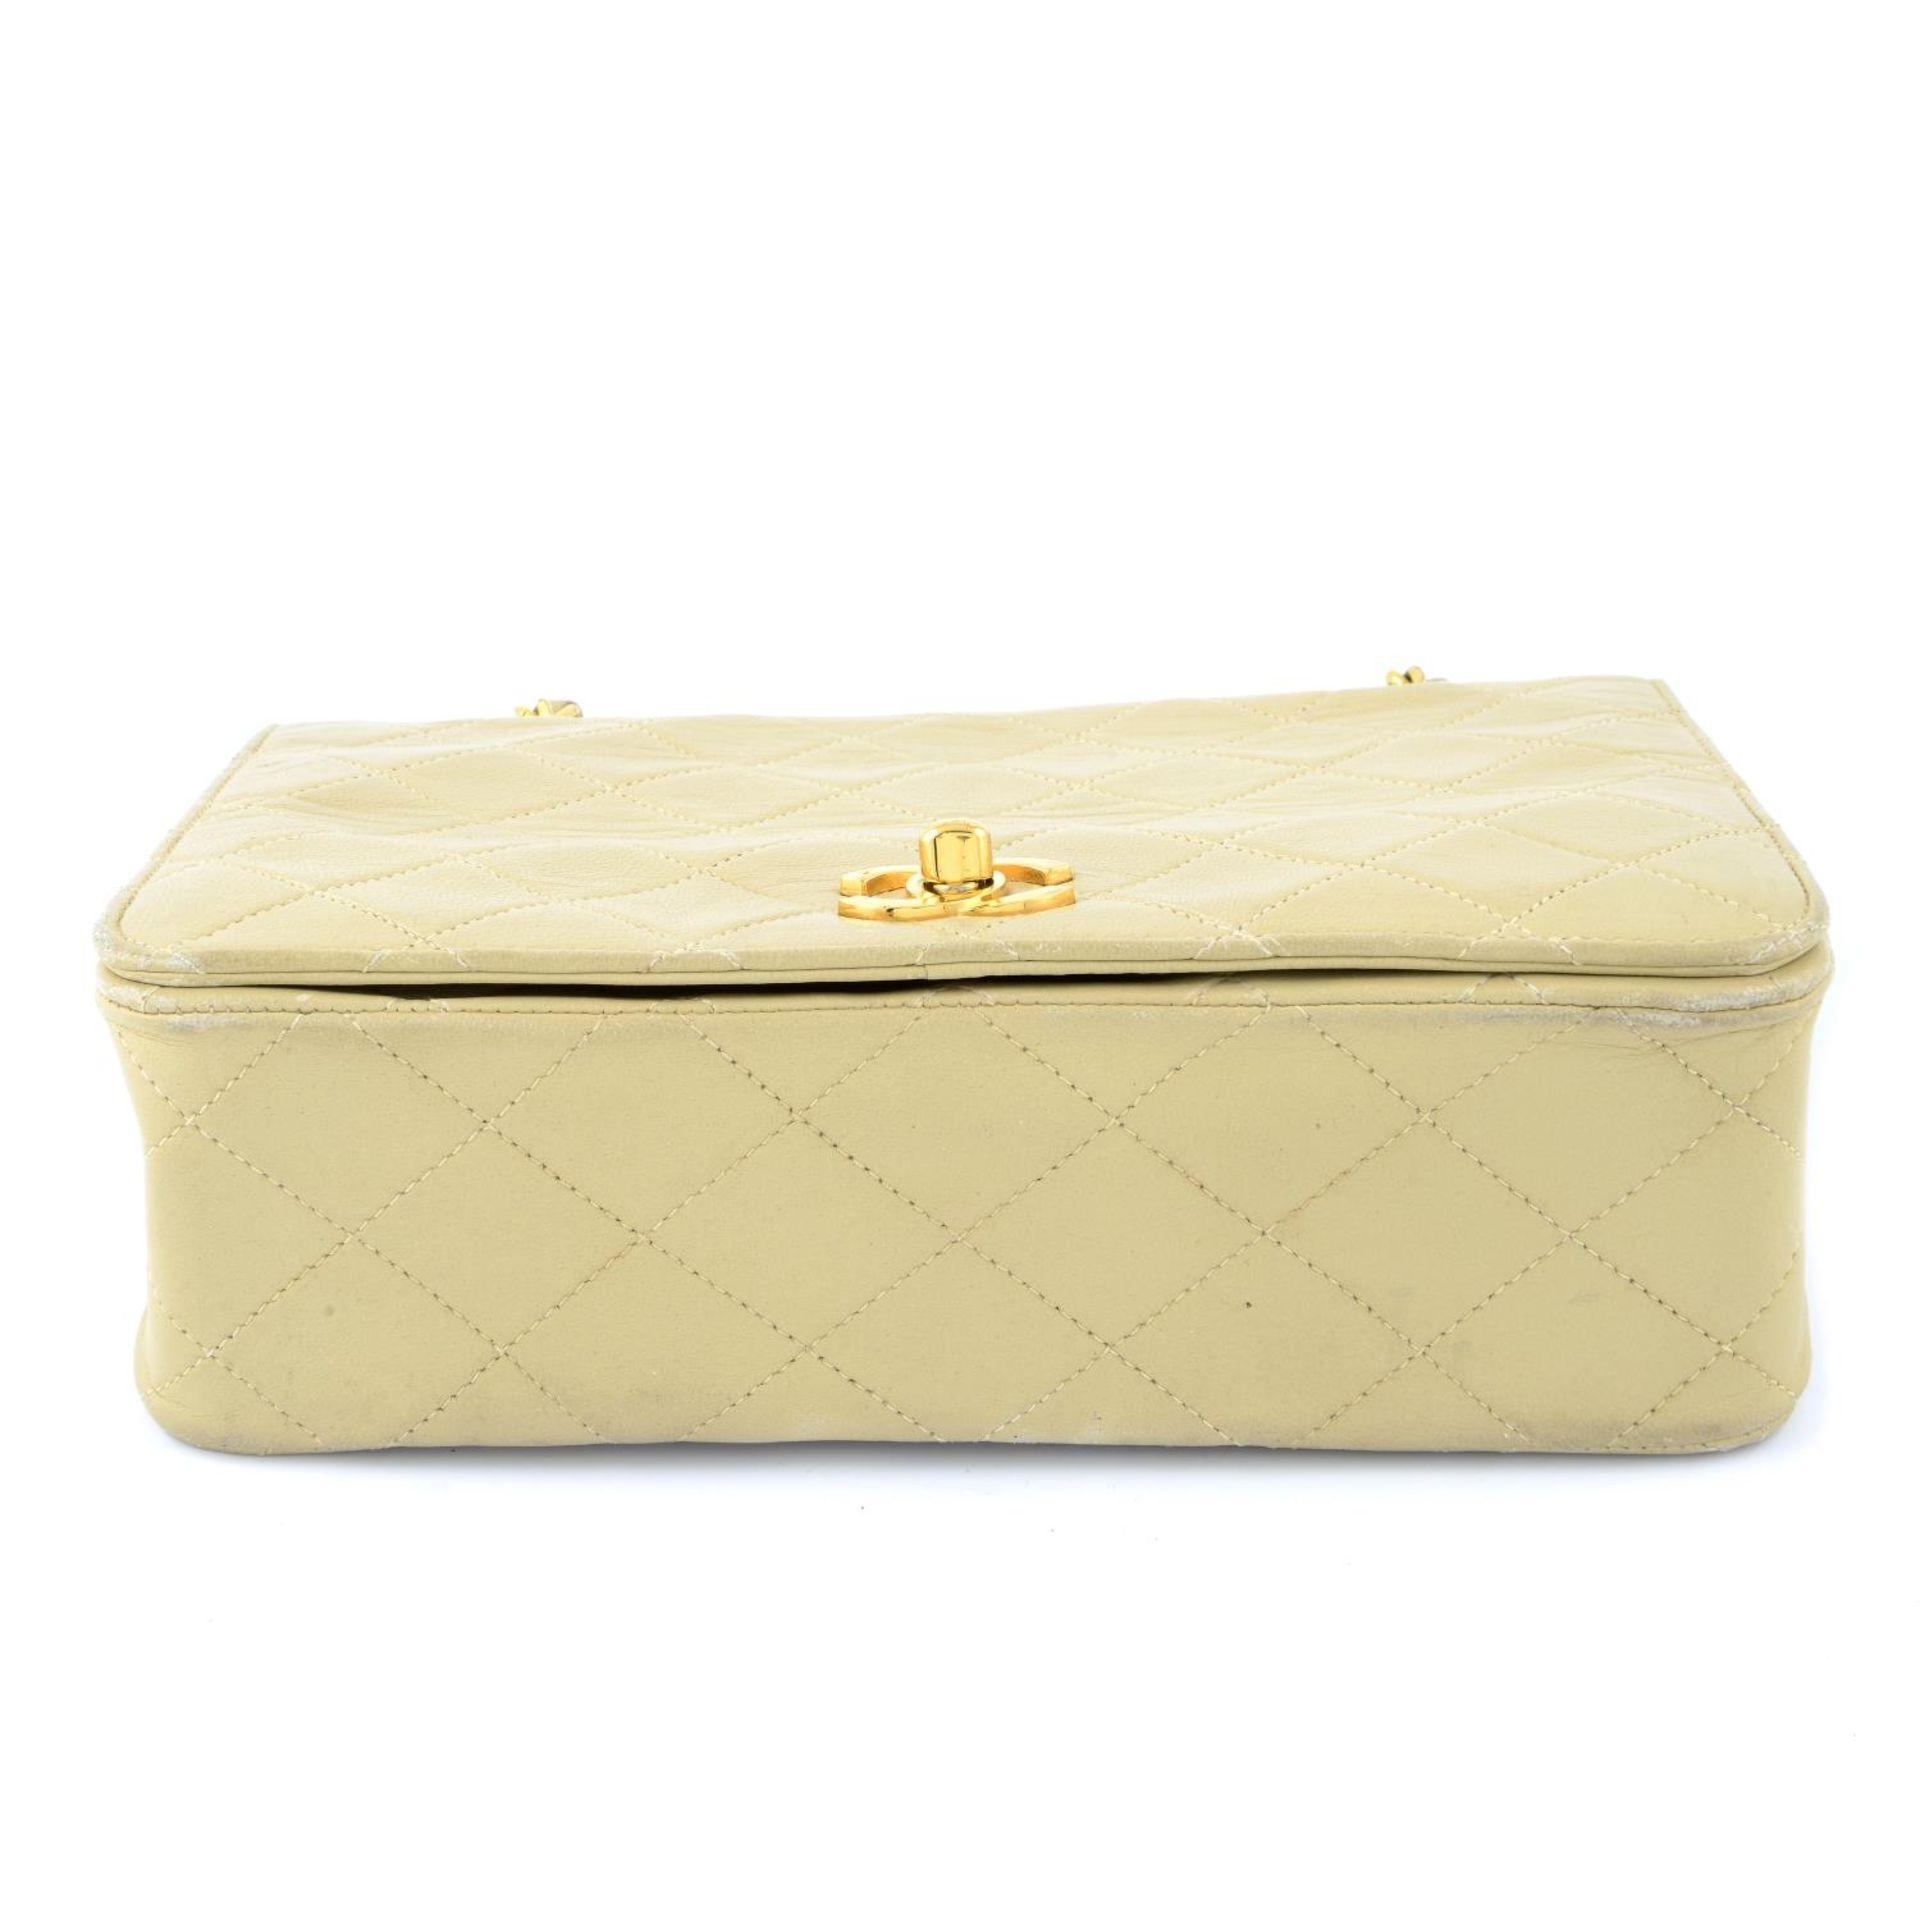 CHANEL - a nude vintage single flap handbag. - Image 5 of 5